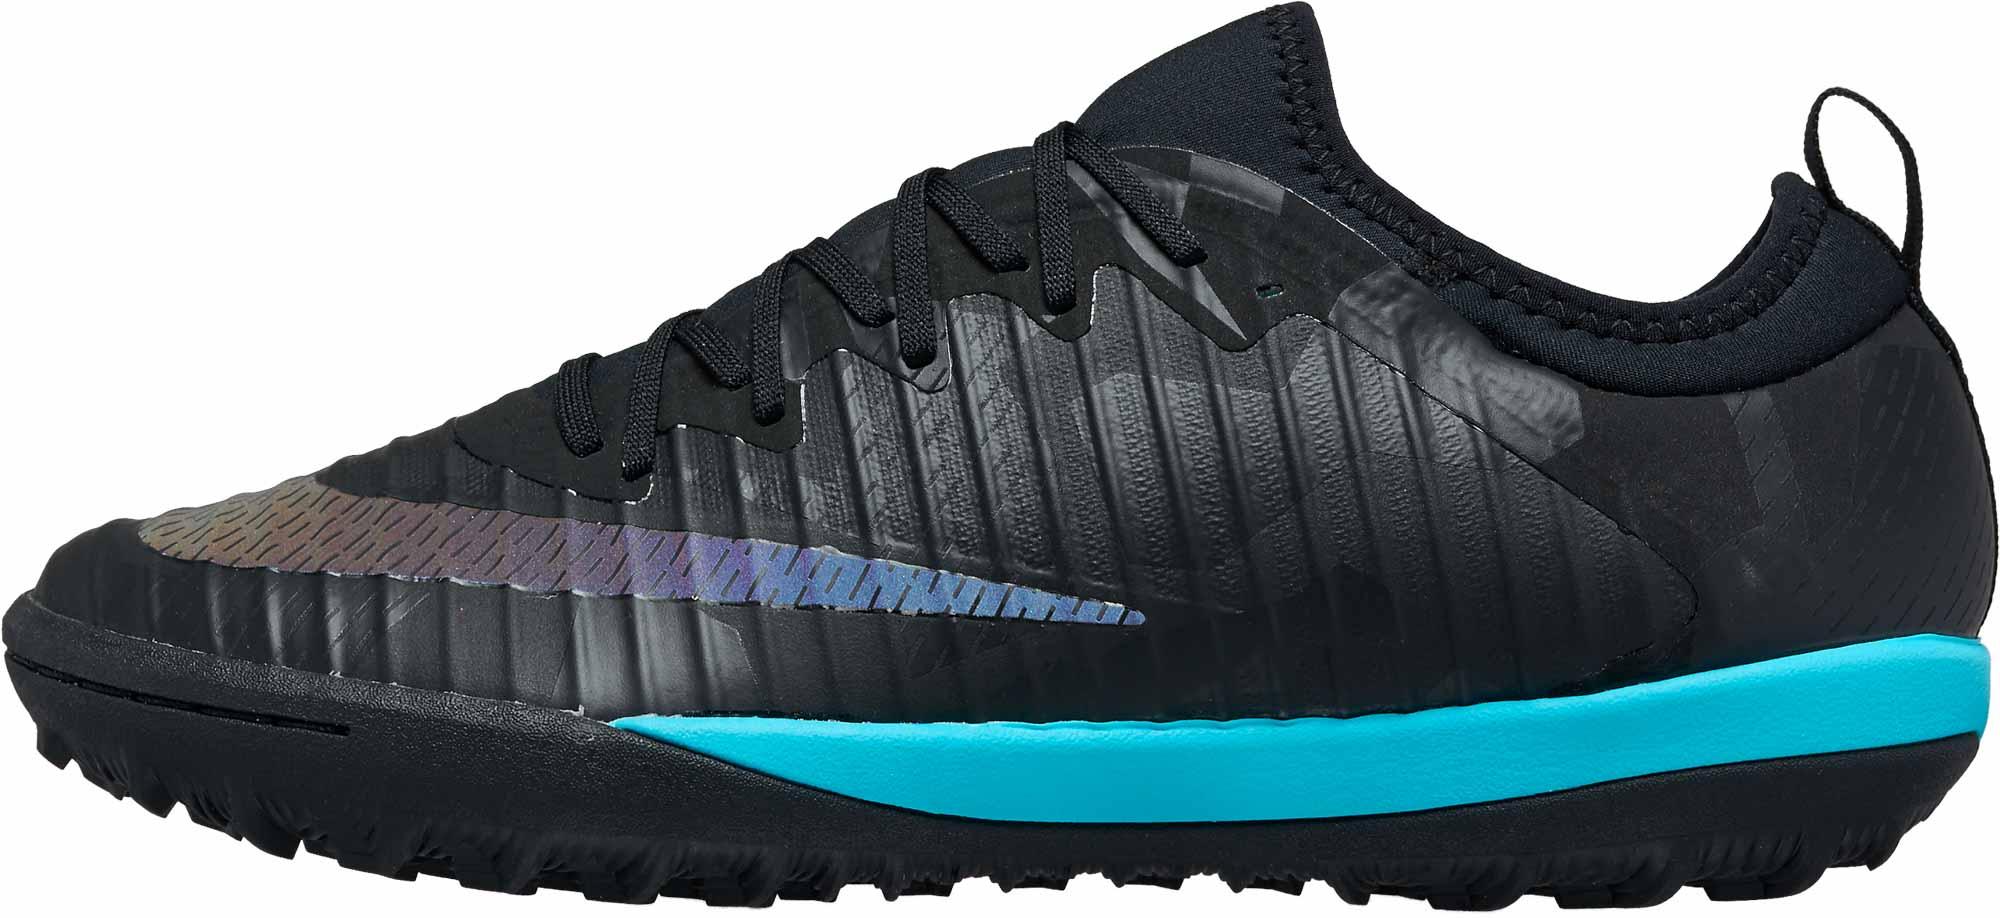 0a2337dd860 Nike MercurialX Finale II TF - SE - Black   Gamma Blue - Soccer Master